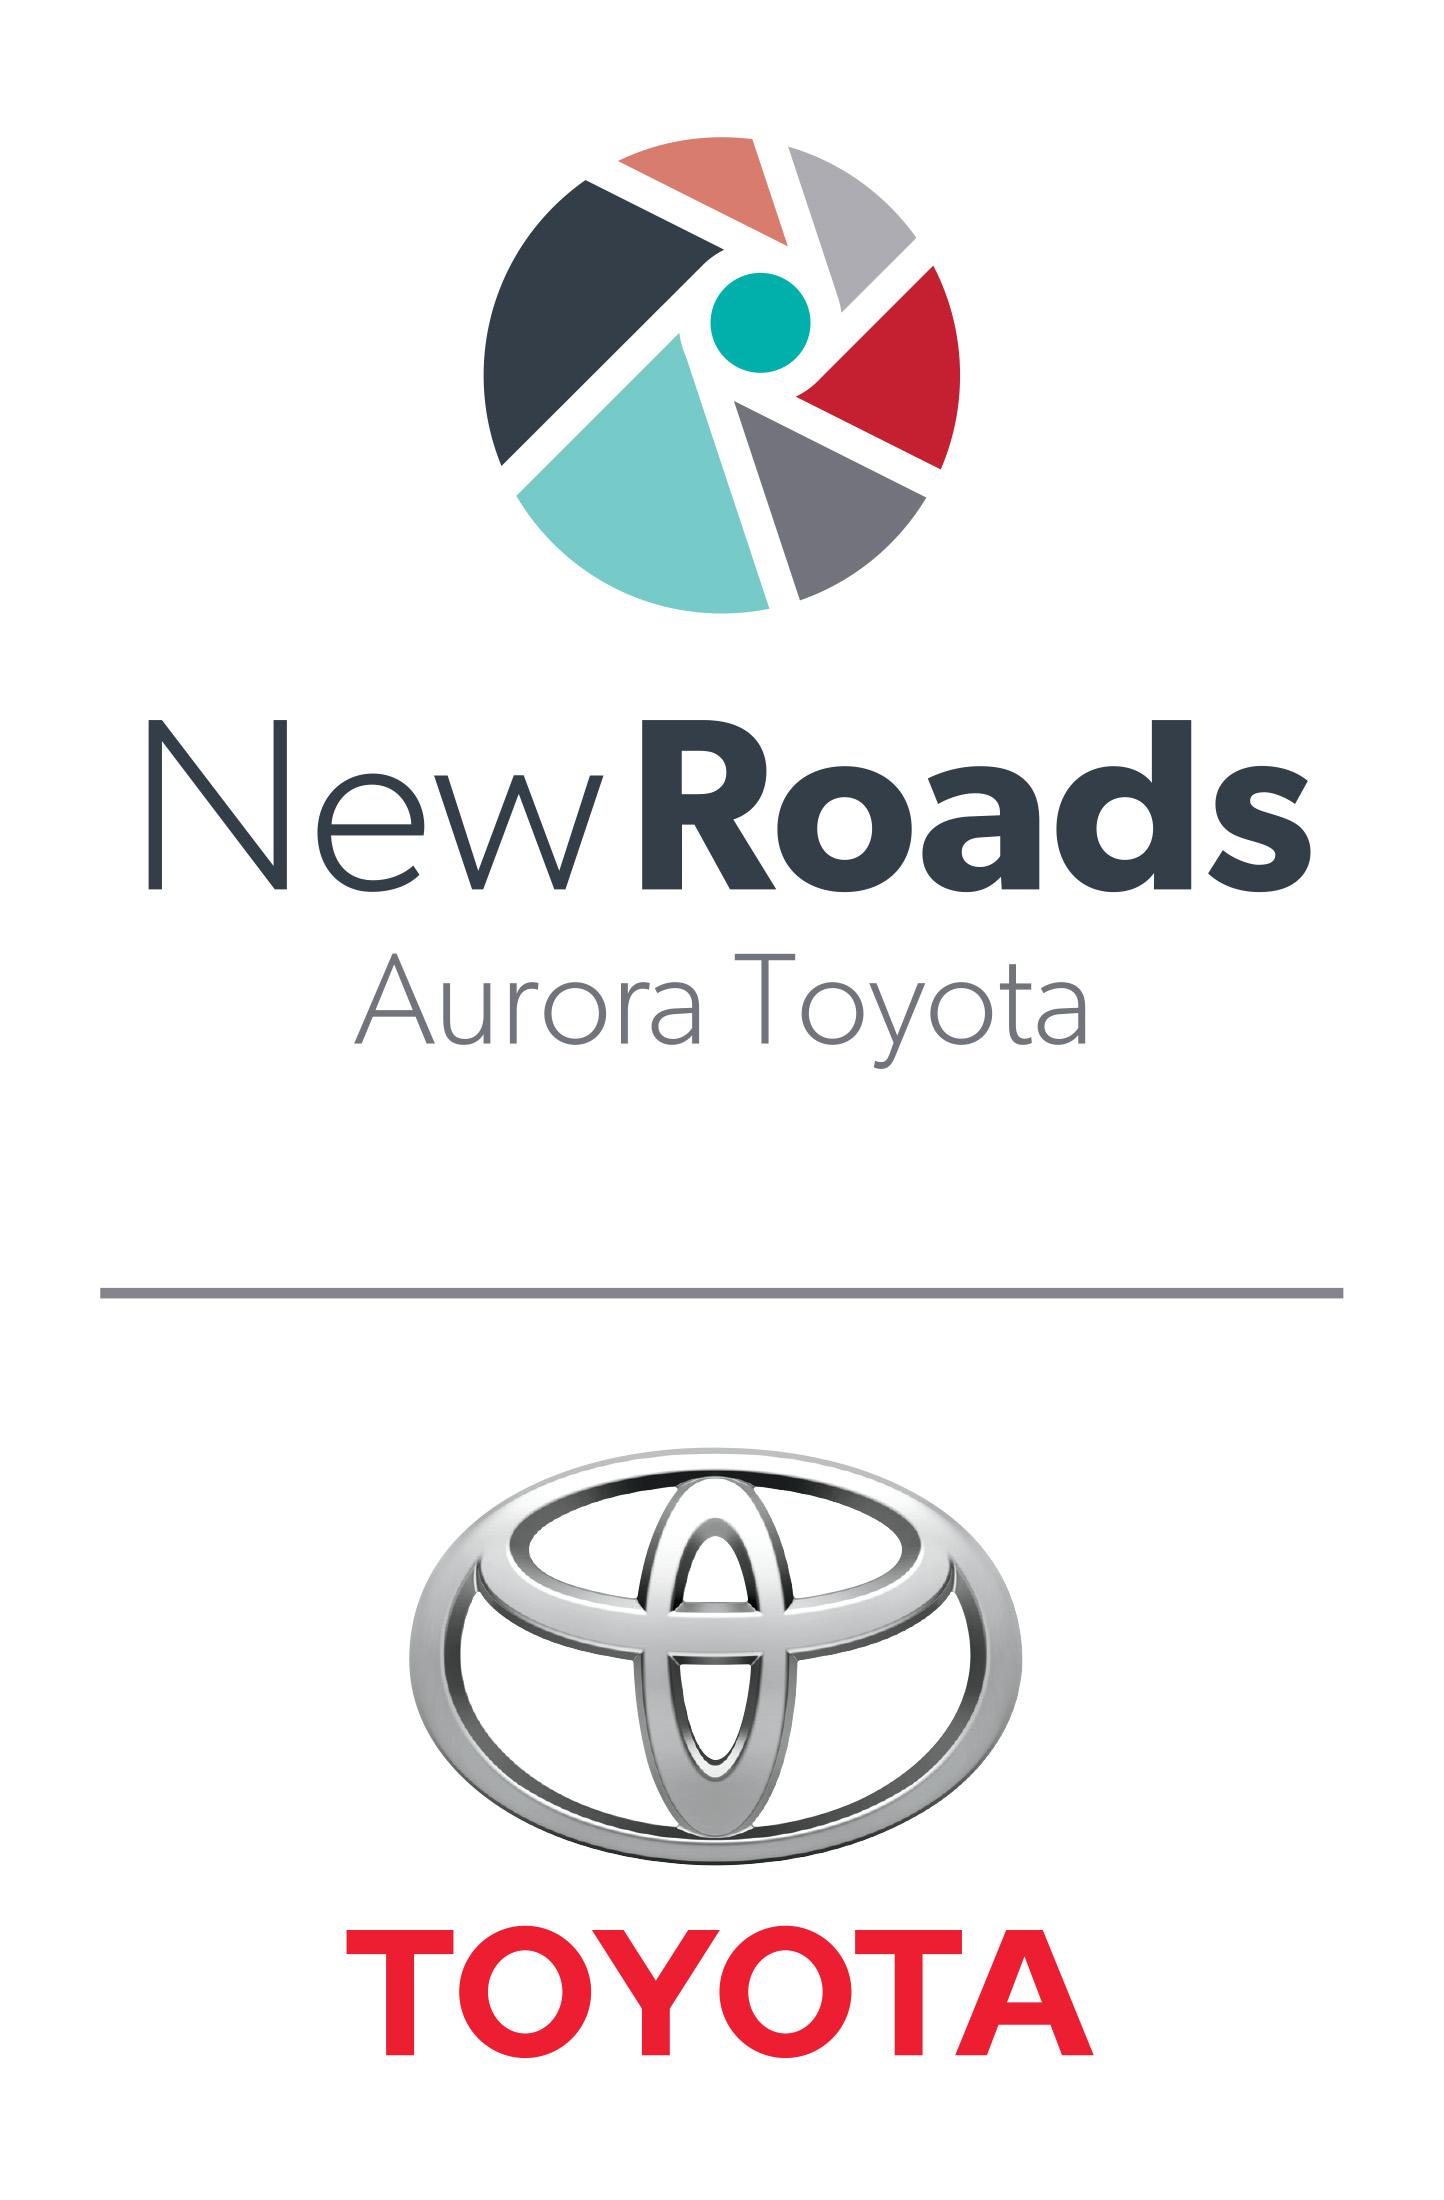 NewRoads Aurora Toyota